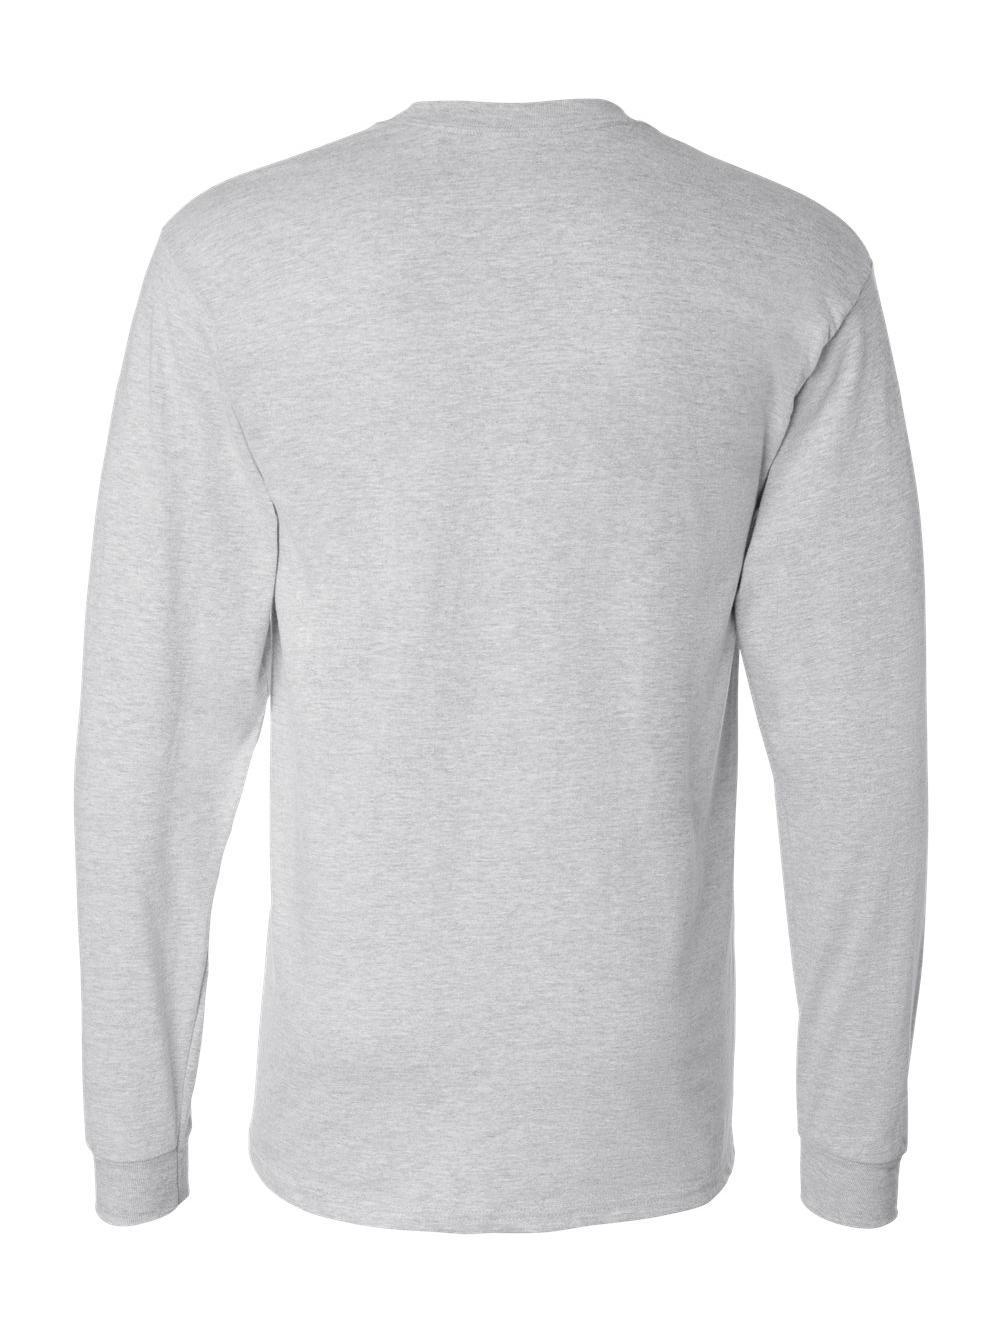 Hanes-Beefy-T-Long-Sleeve-T-Shirt-5186 thumbnail 4